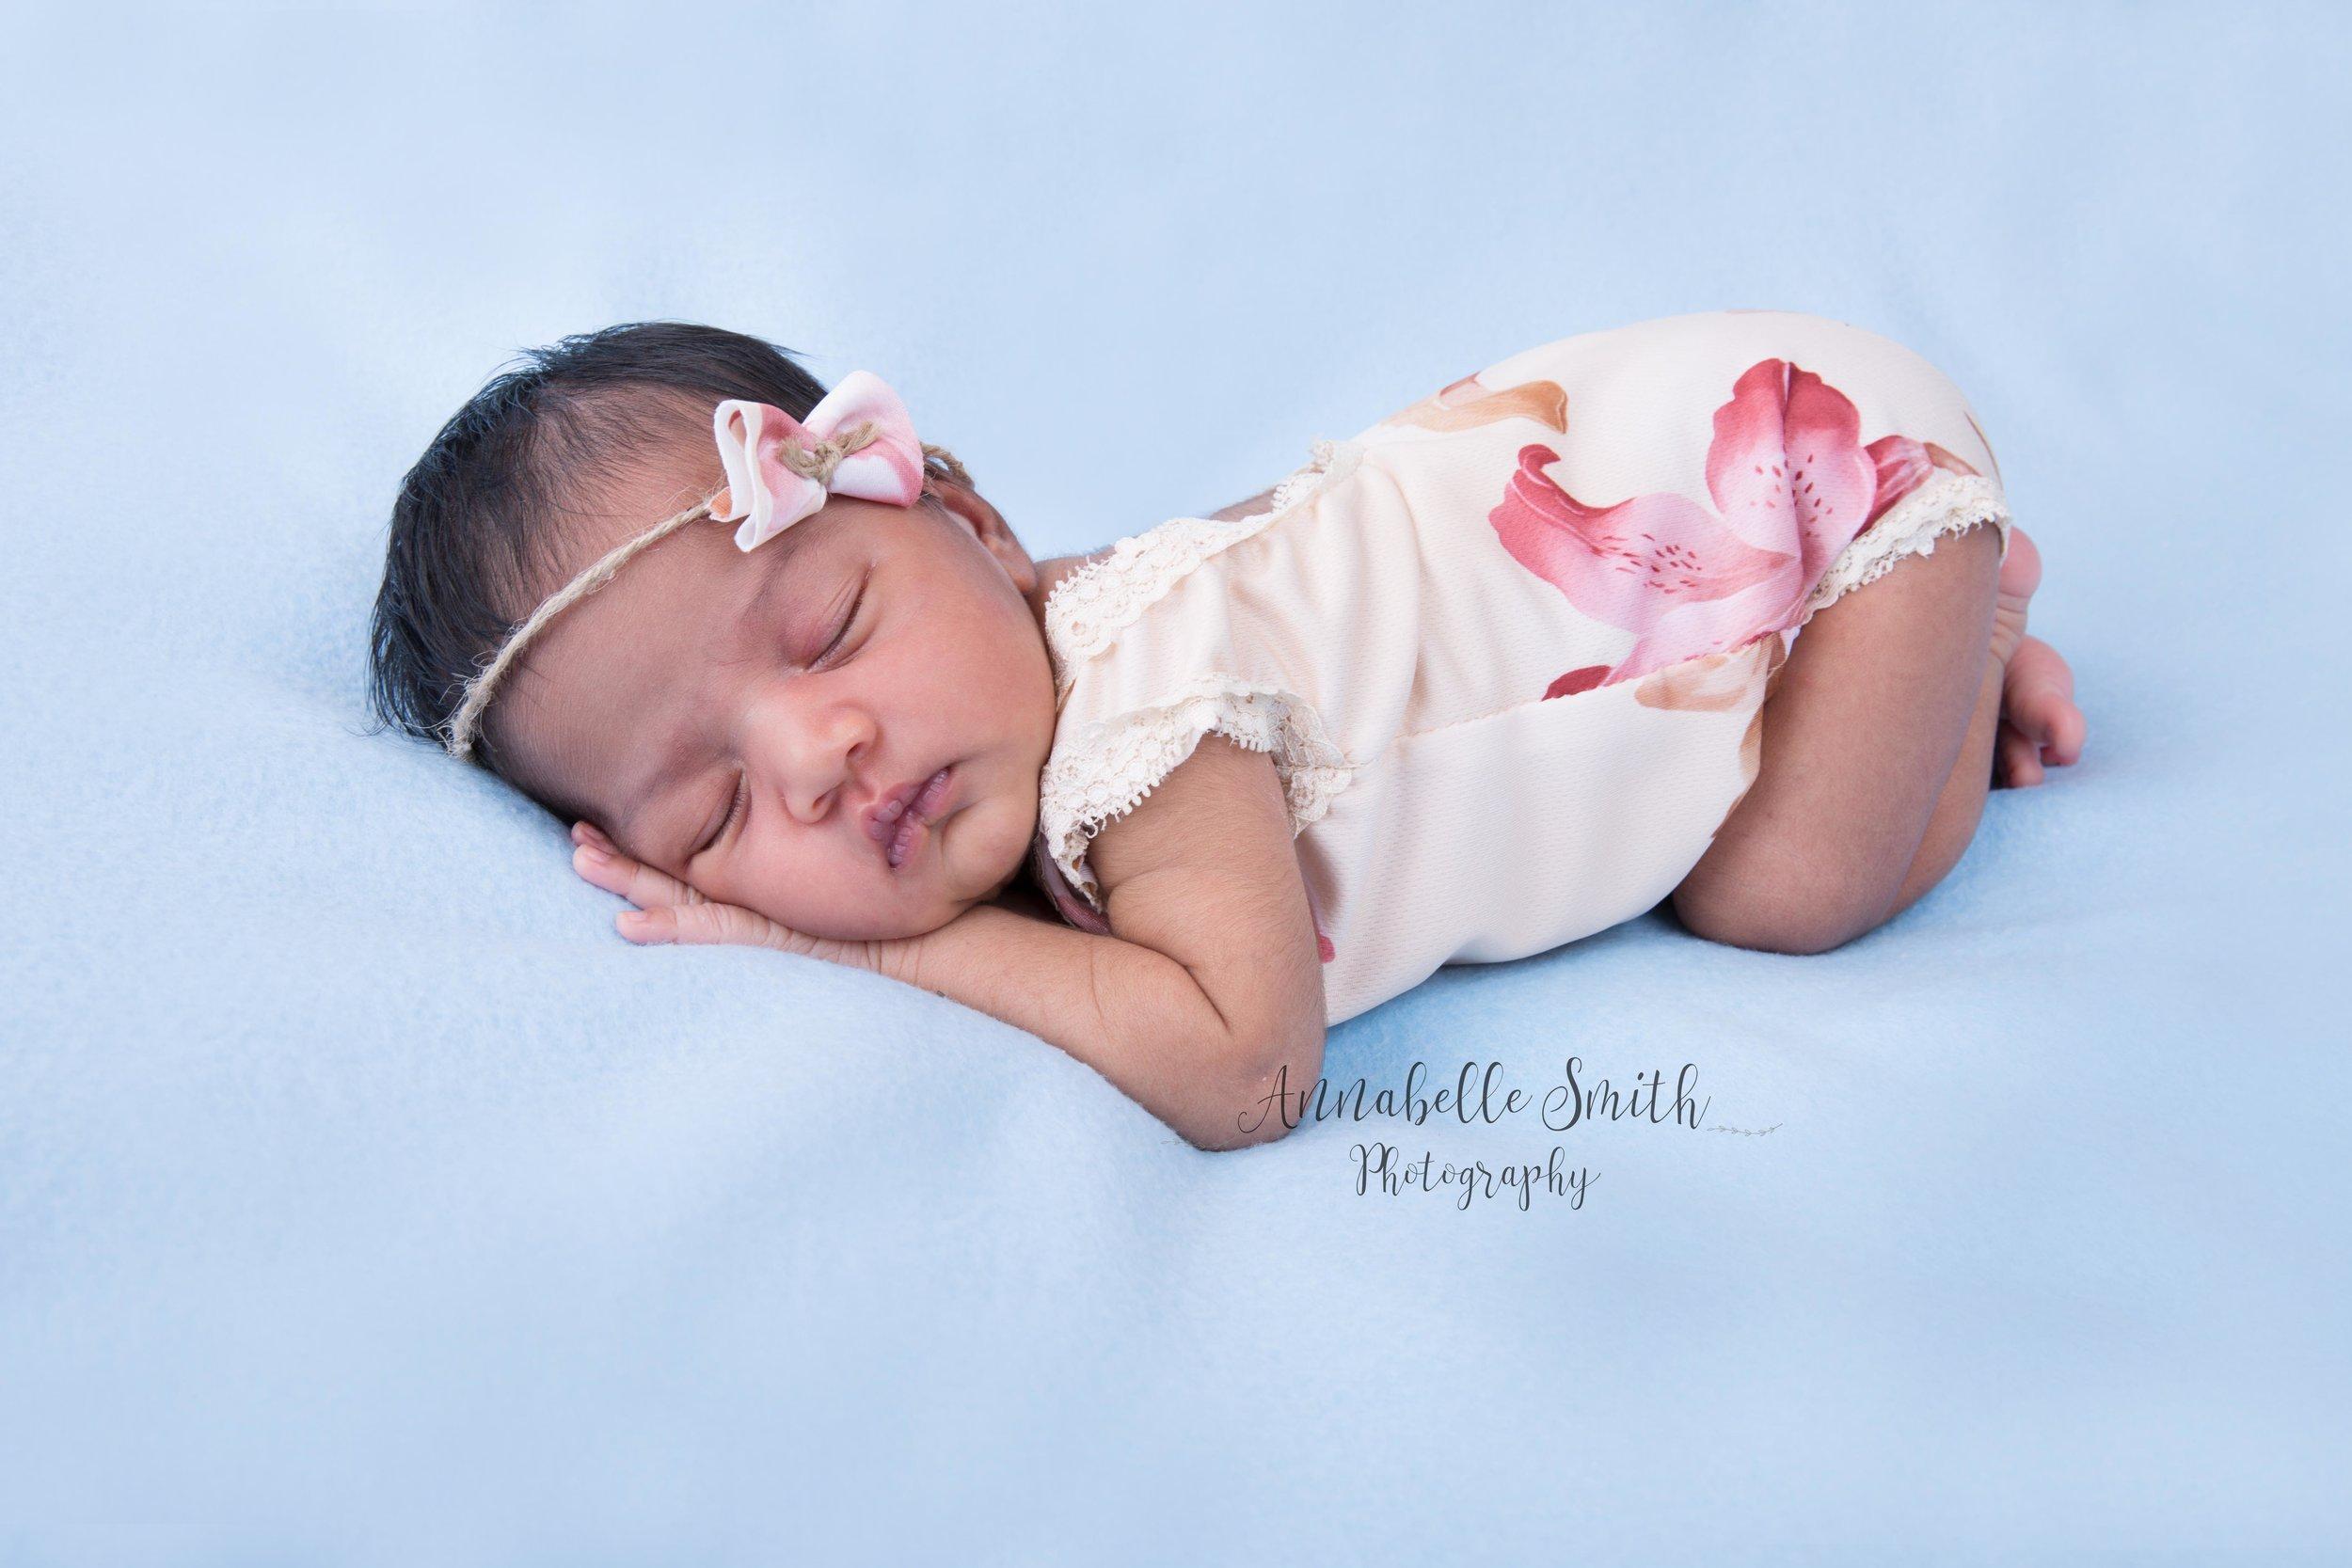 Newborn photography artwork walton on thames.jpg